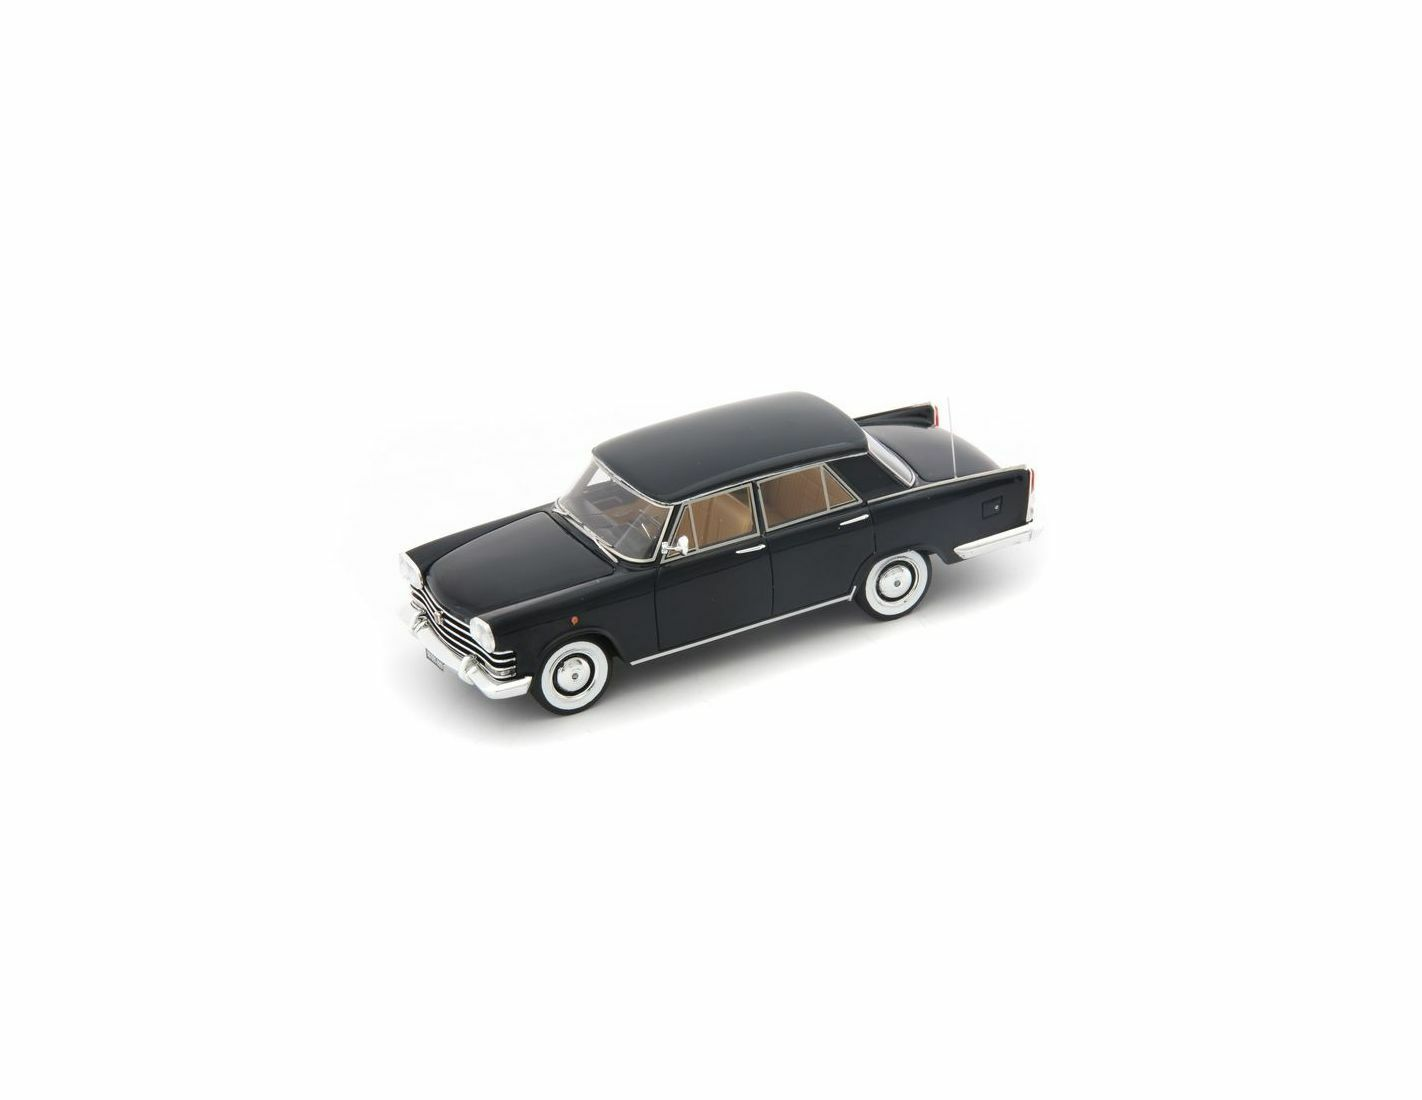 online barato Autocult ATC05021 FIAT 2100 BERLINA SPECIALE SPECIALE SPECIALE 1959 DARK azul 1 43 Modellino  estilo clásico